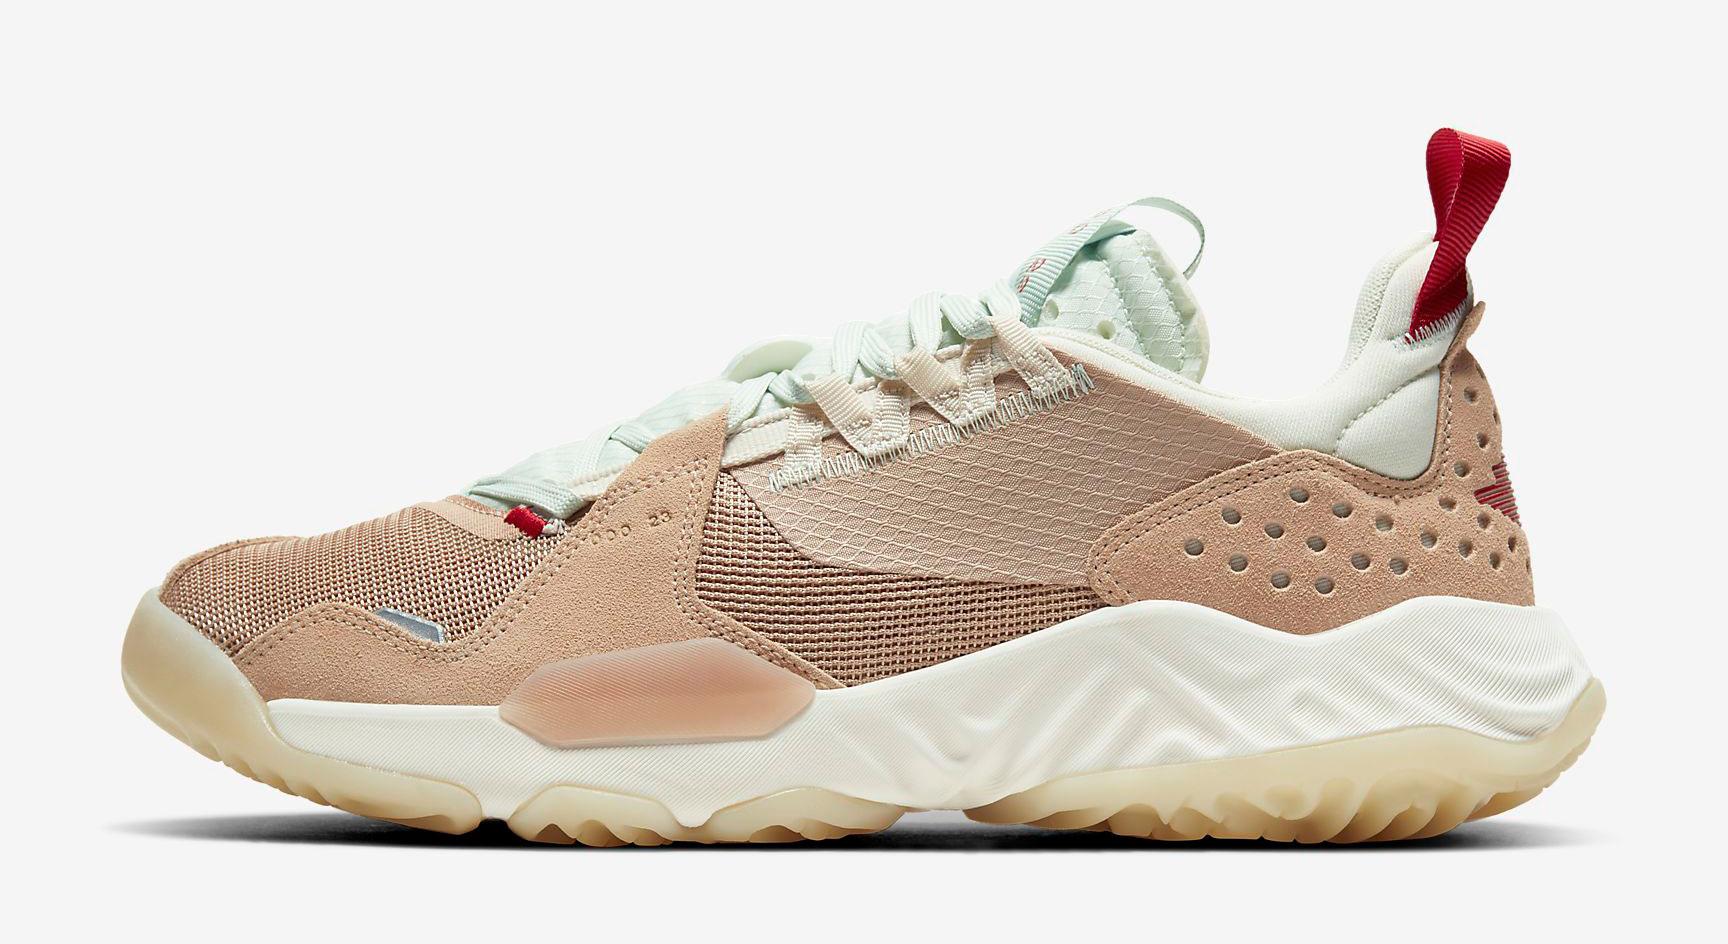 jordan-delta-shoe-vachetta-tan-release-date